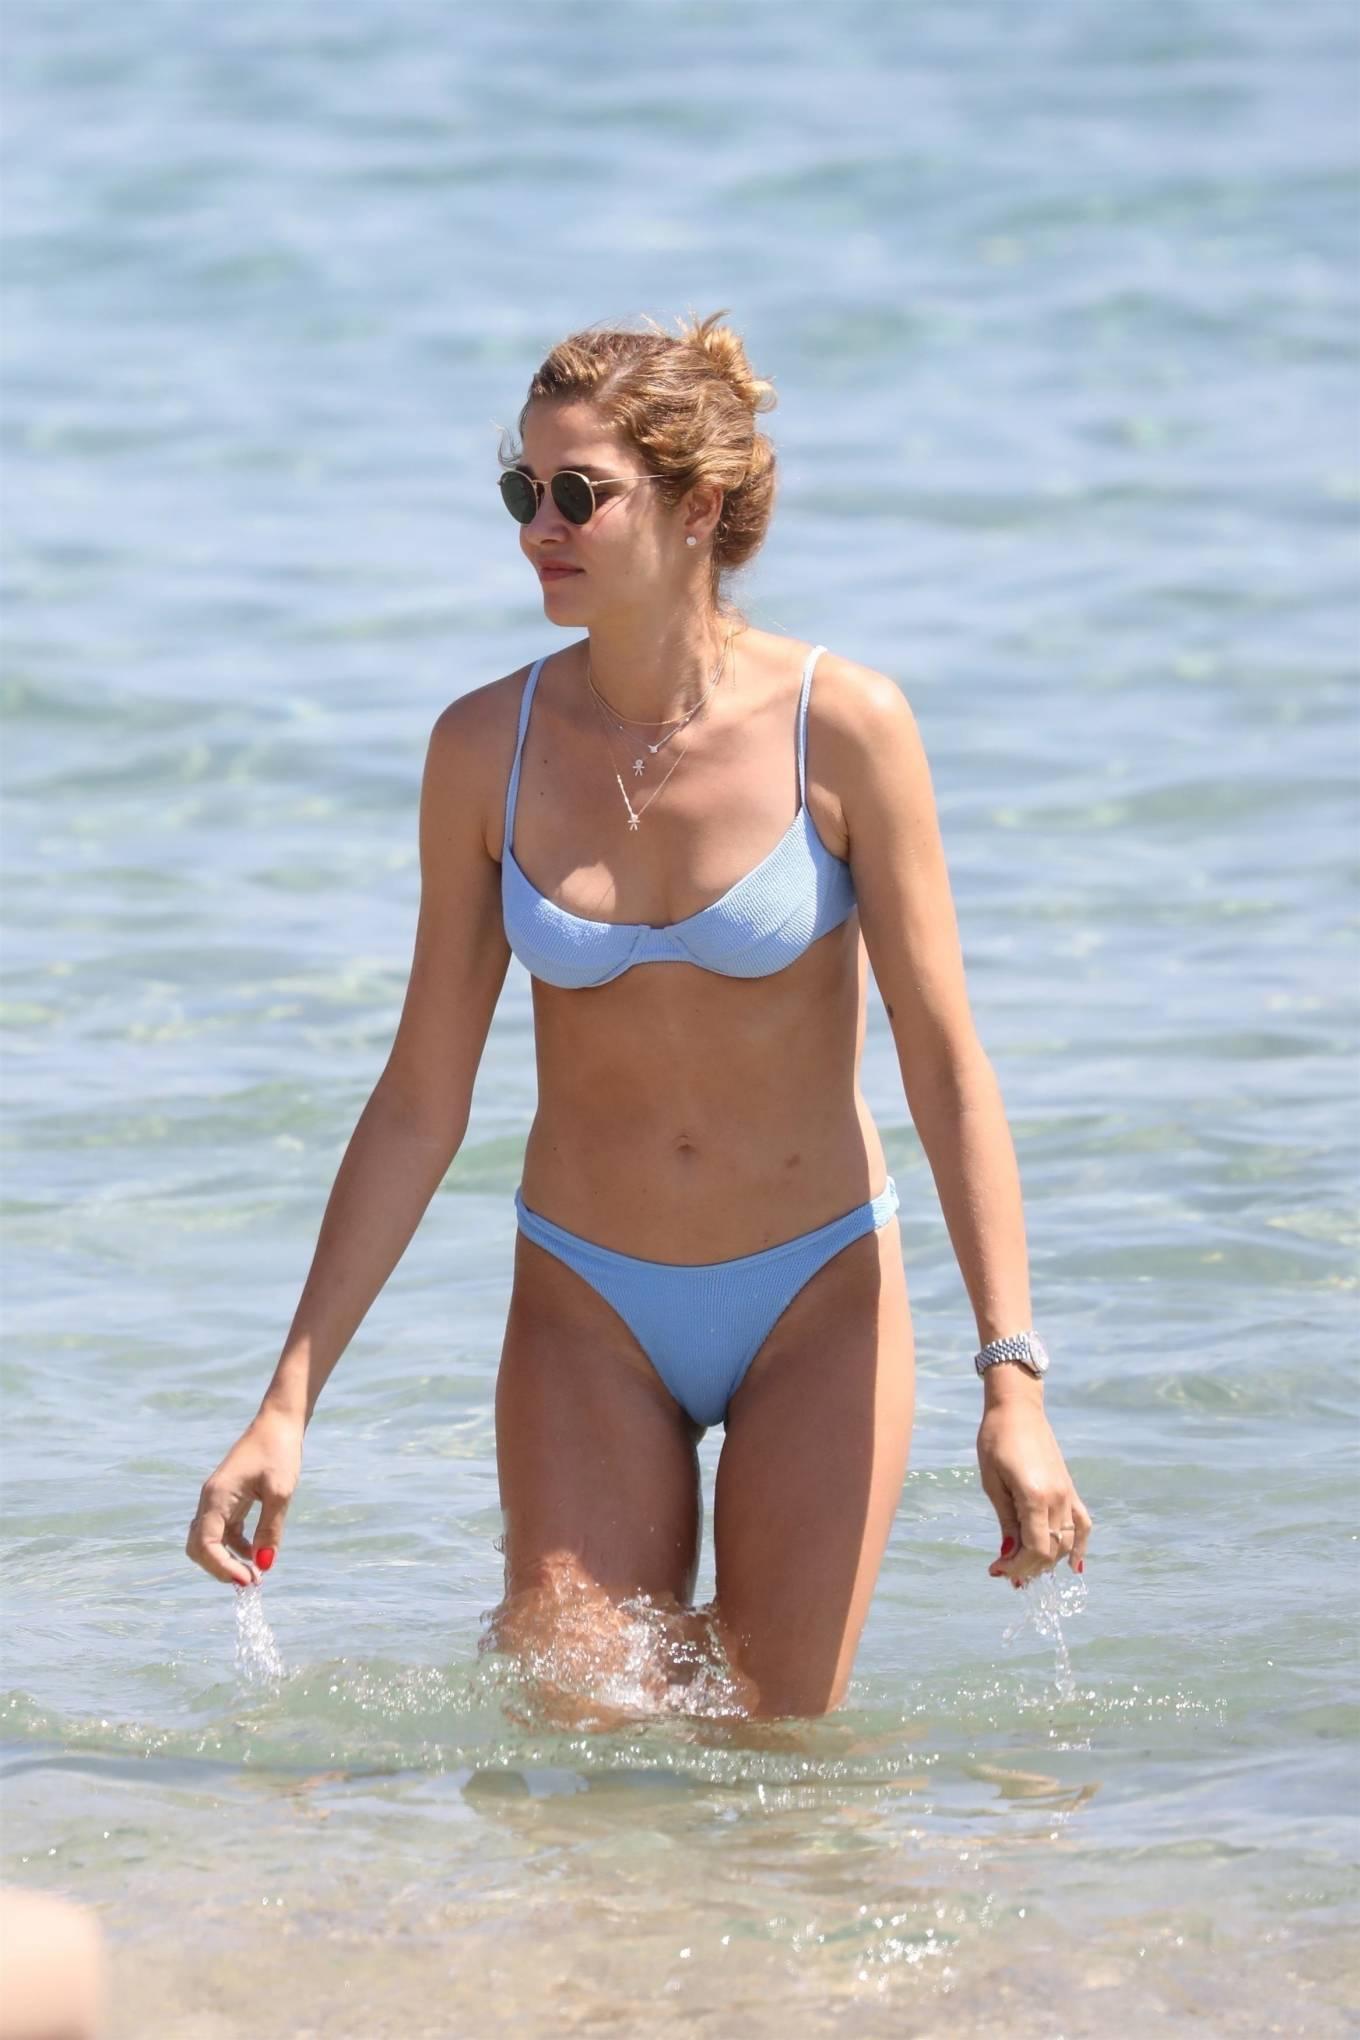 Ana Beatriz Barros 2021 : Ana Beatriz Barros – In a bikini in Mykonos-02